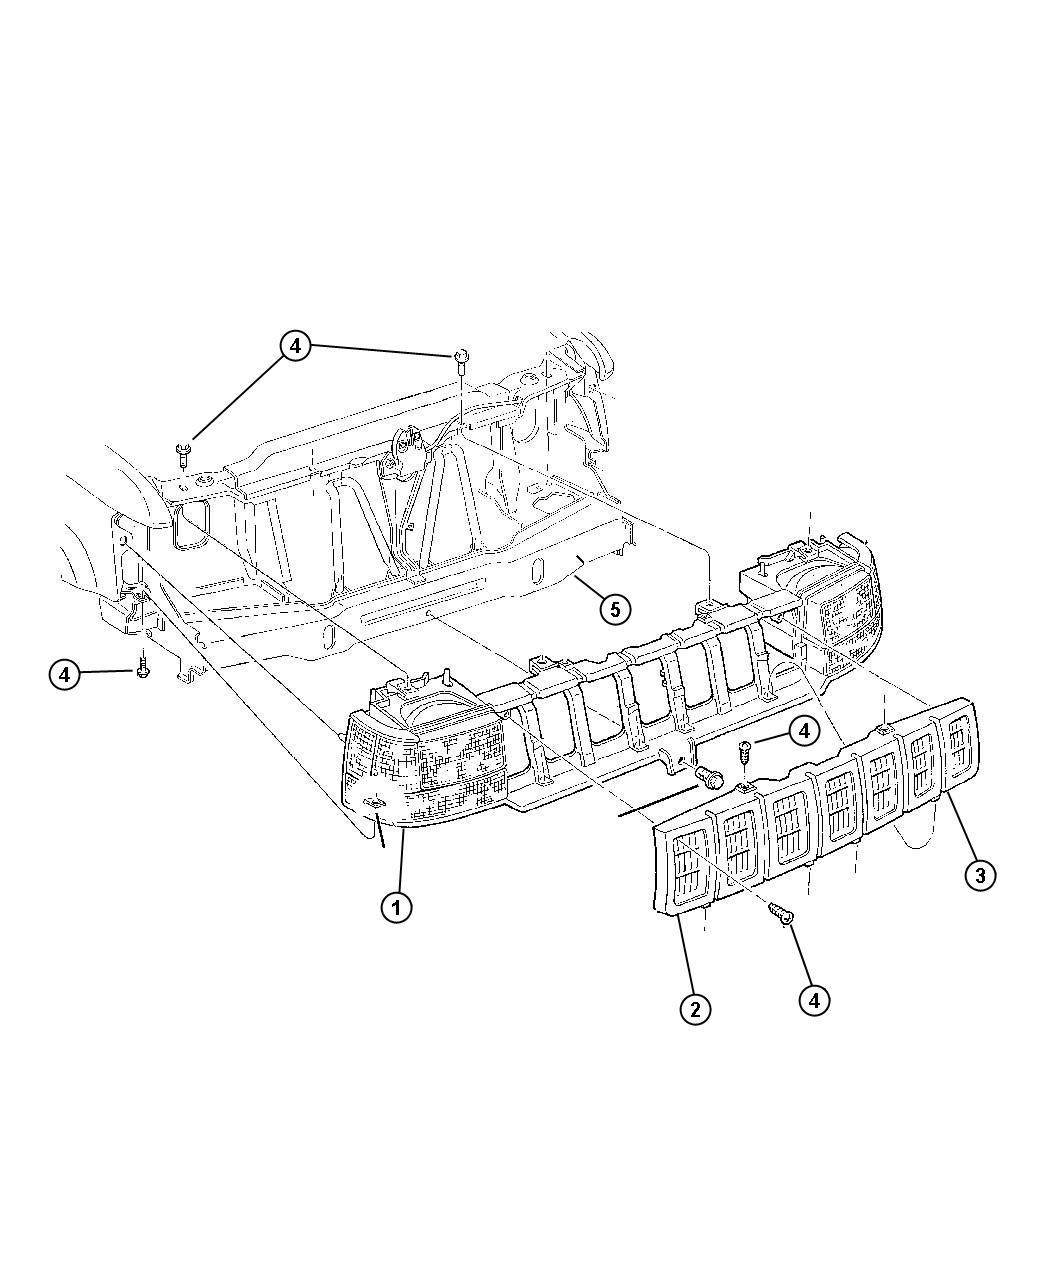 2012 Dodge Ram 1500 Grille  Radiator   S4   Mfn   Body